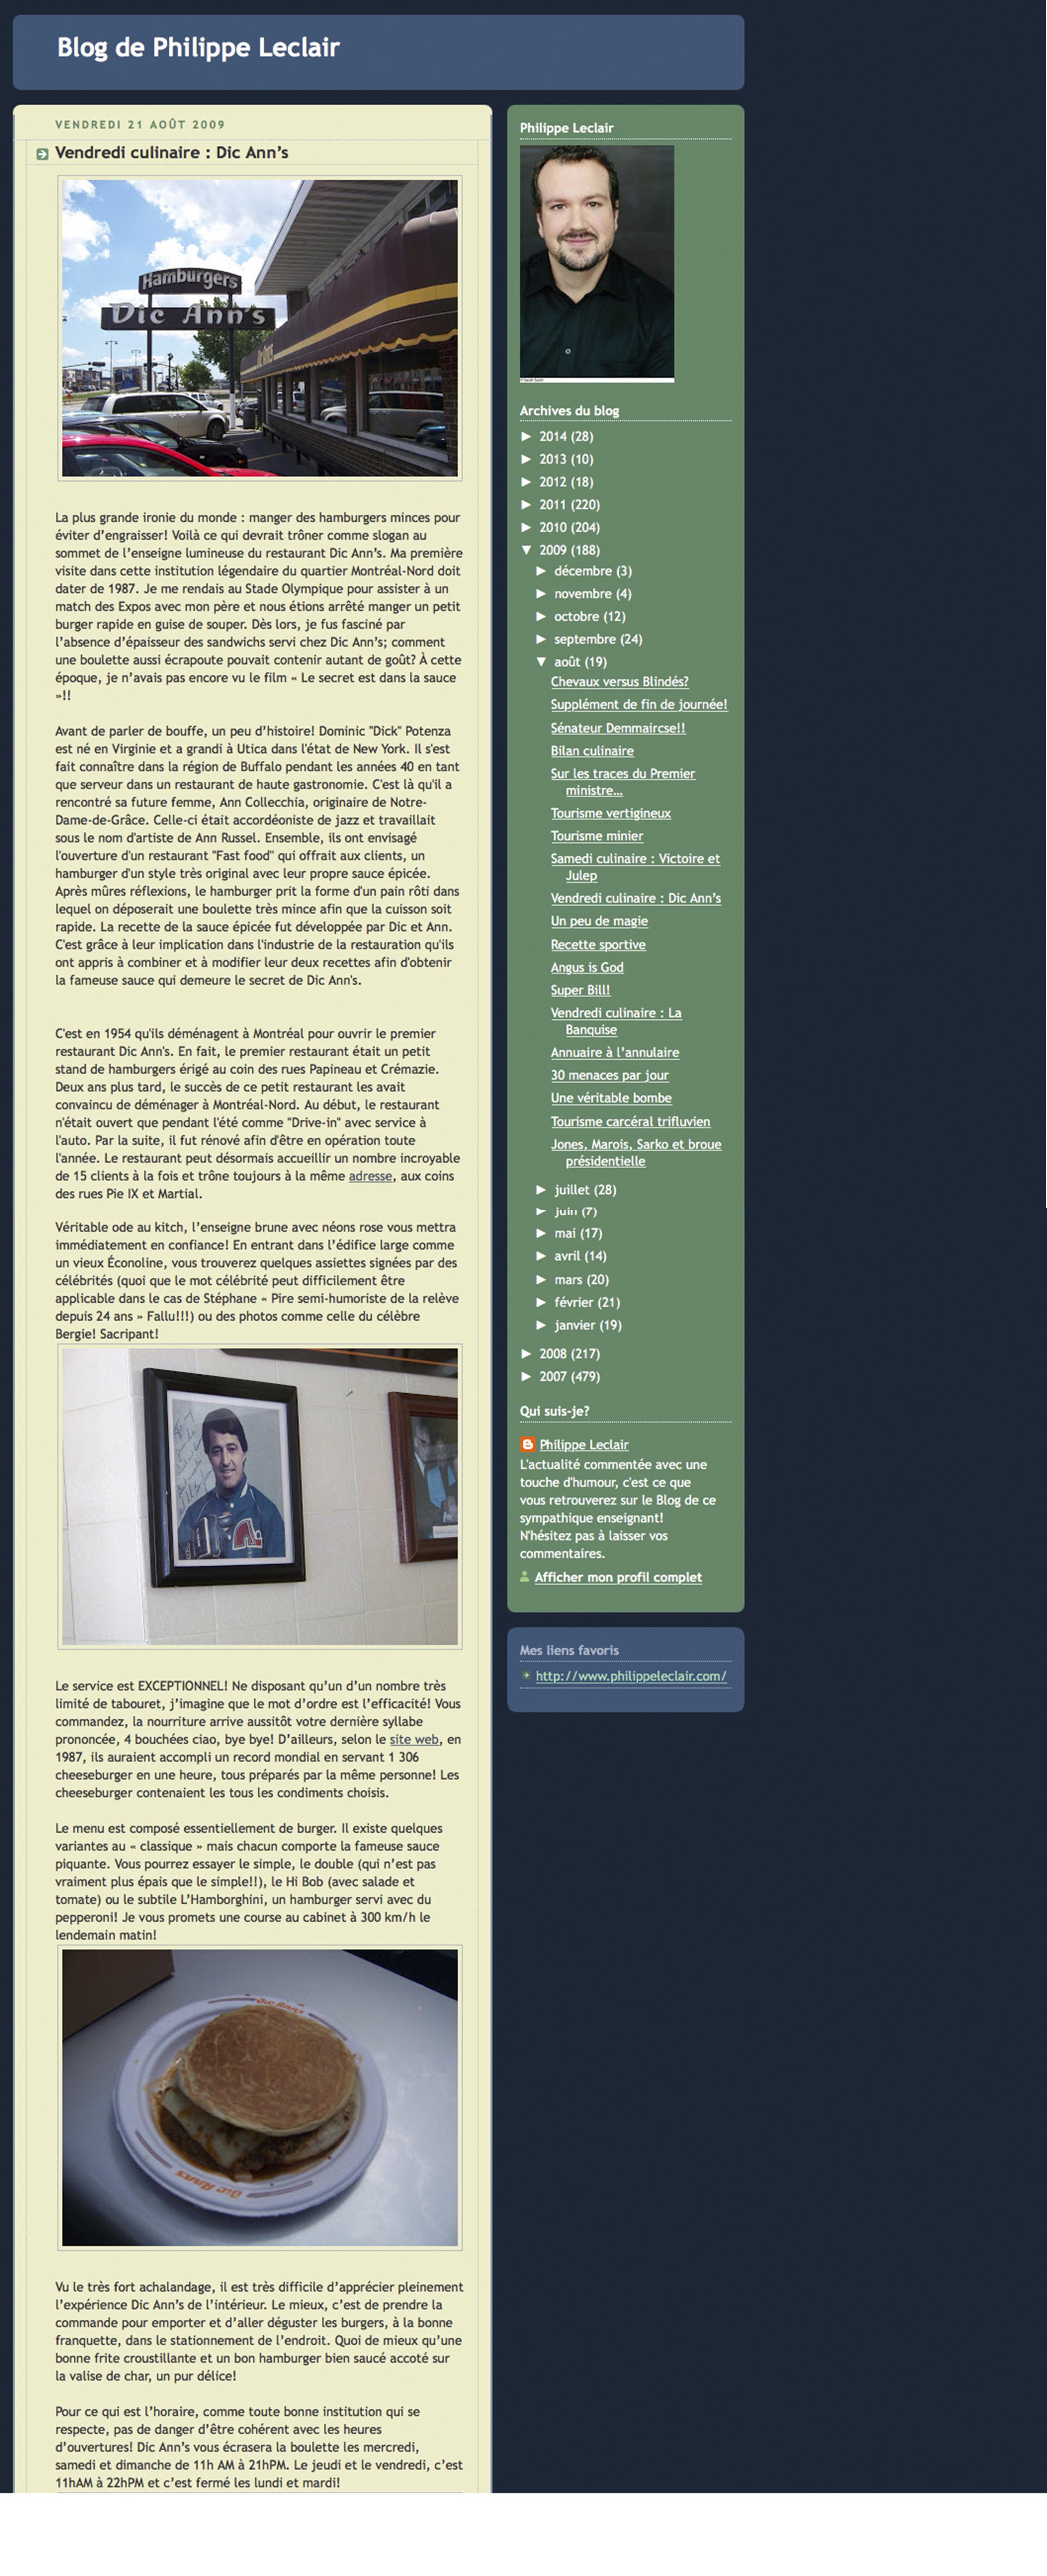 HTTP://WWW.PHILIPPELECLAIR.COM